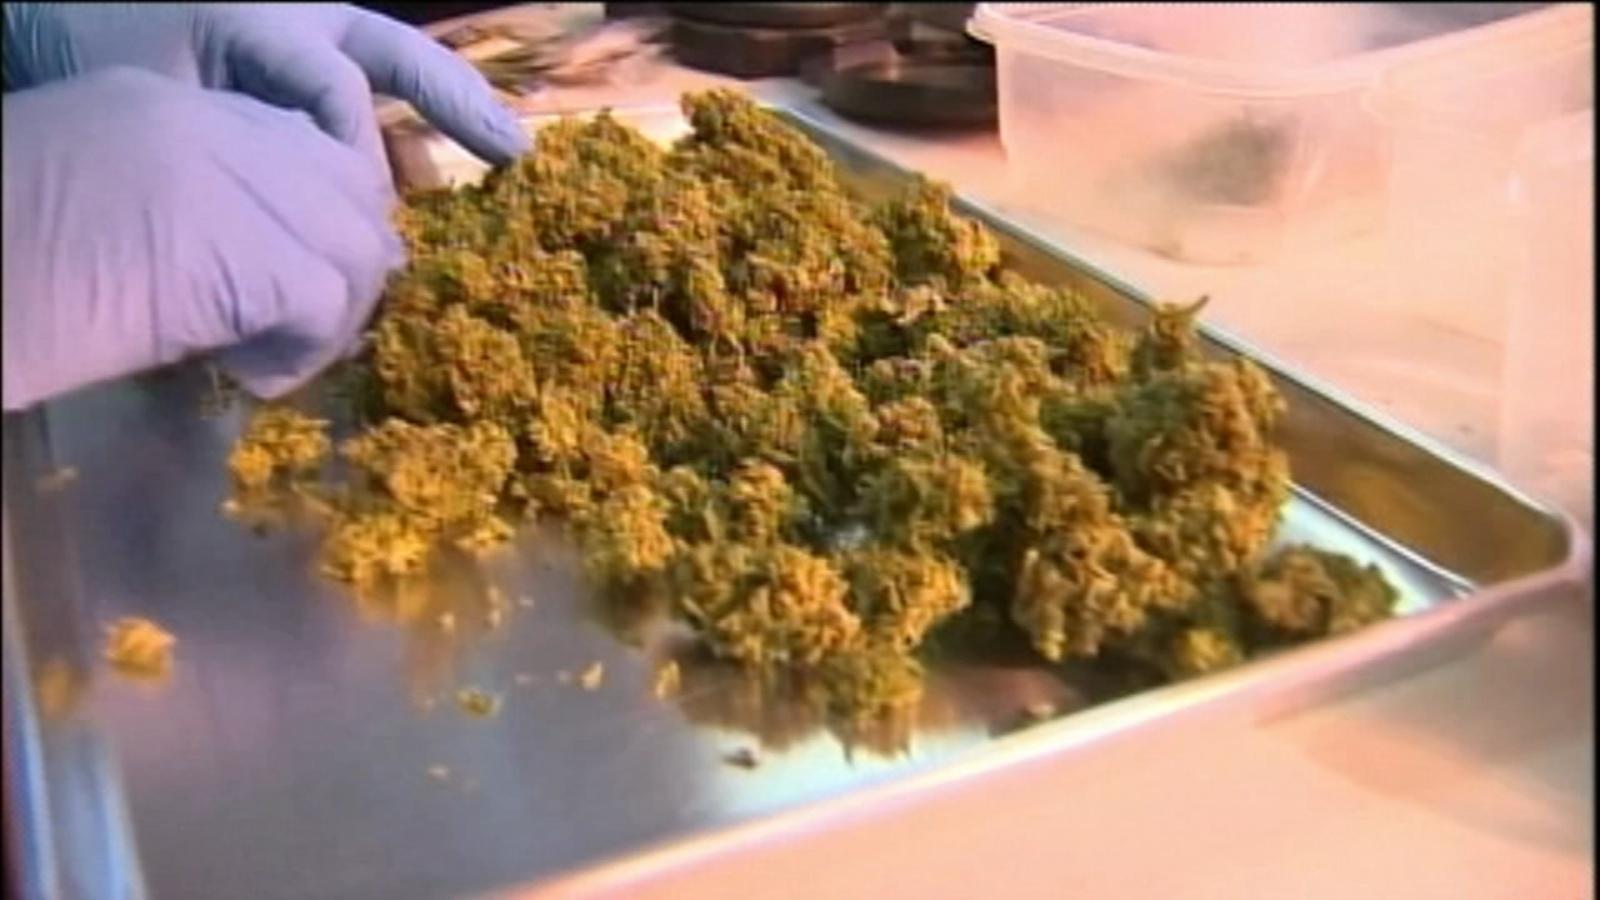 Marijuana festival to be held in Andersonville on 4/20